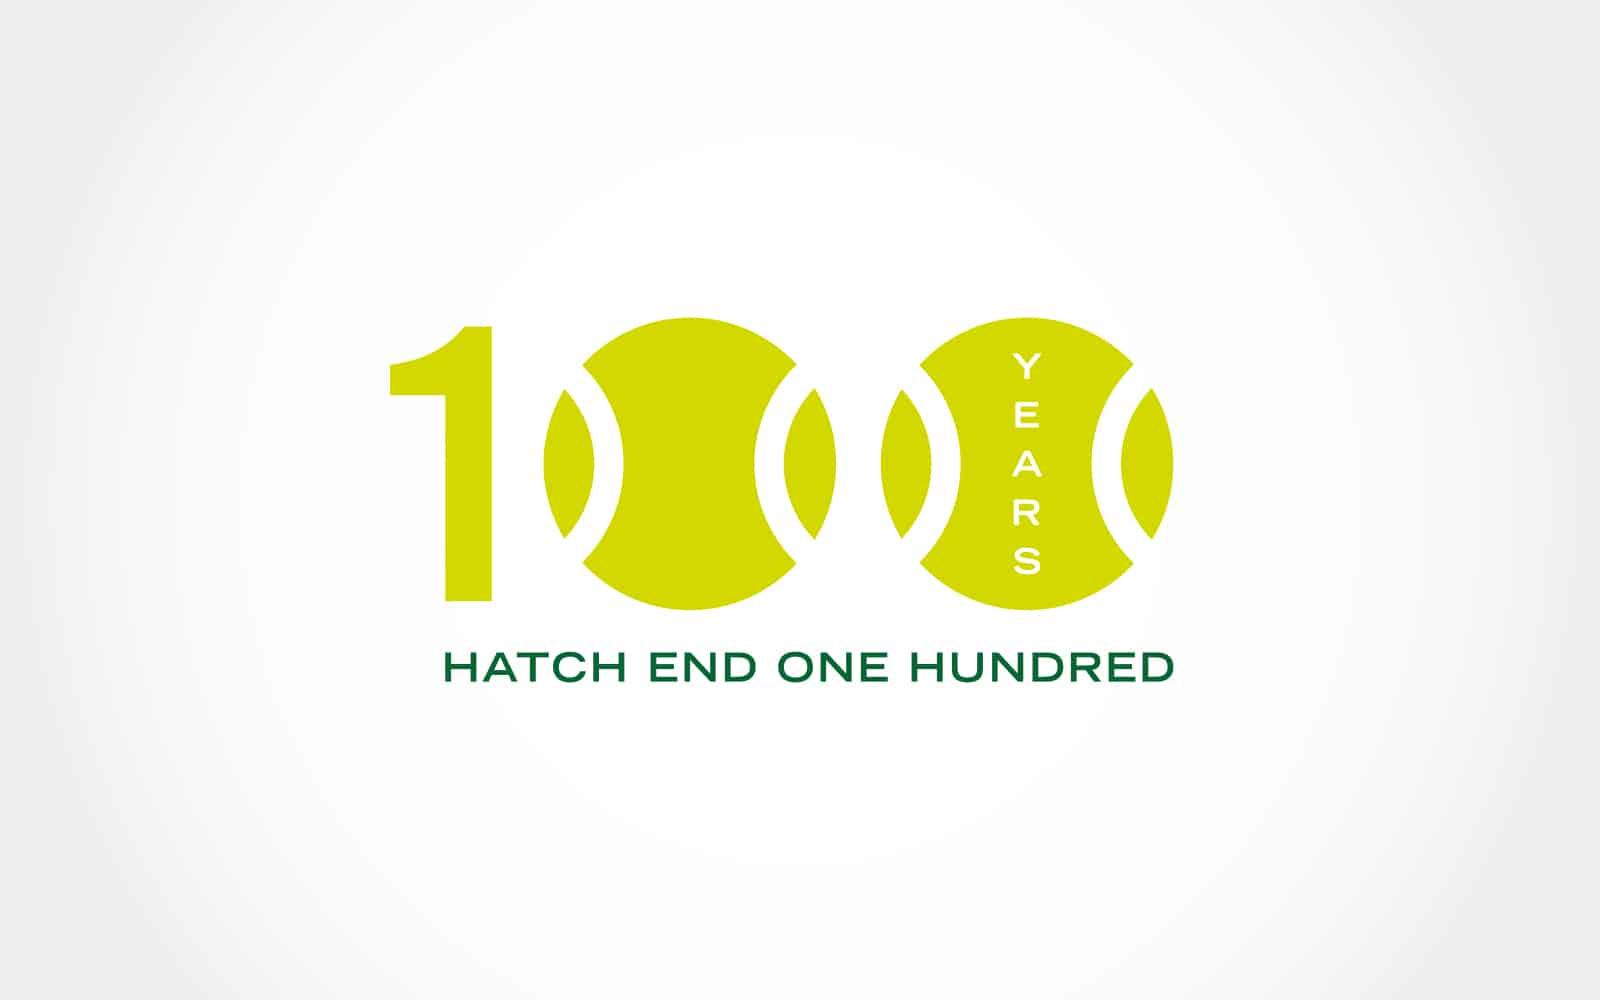 de4a832ec Hatch End Tennis Club: Re-Brand - RCD - Creative Design • Digital ...